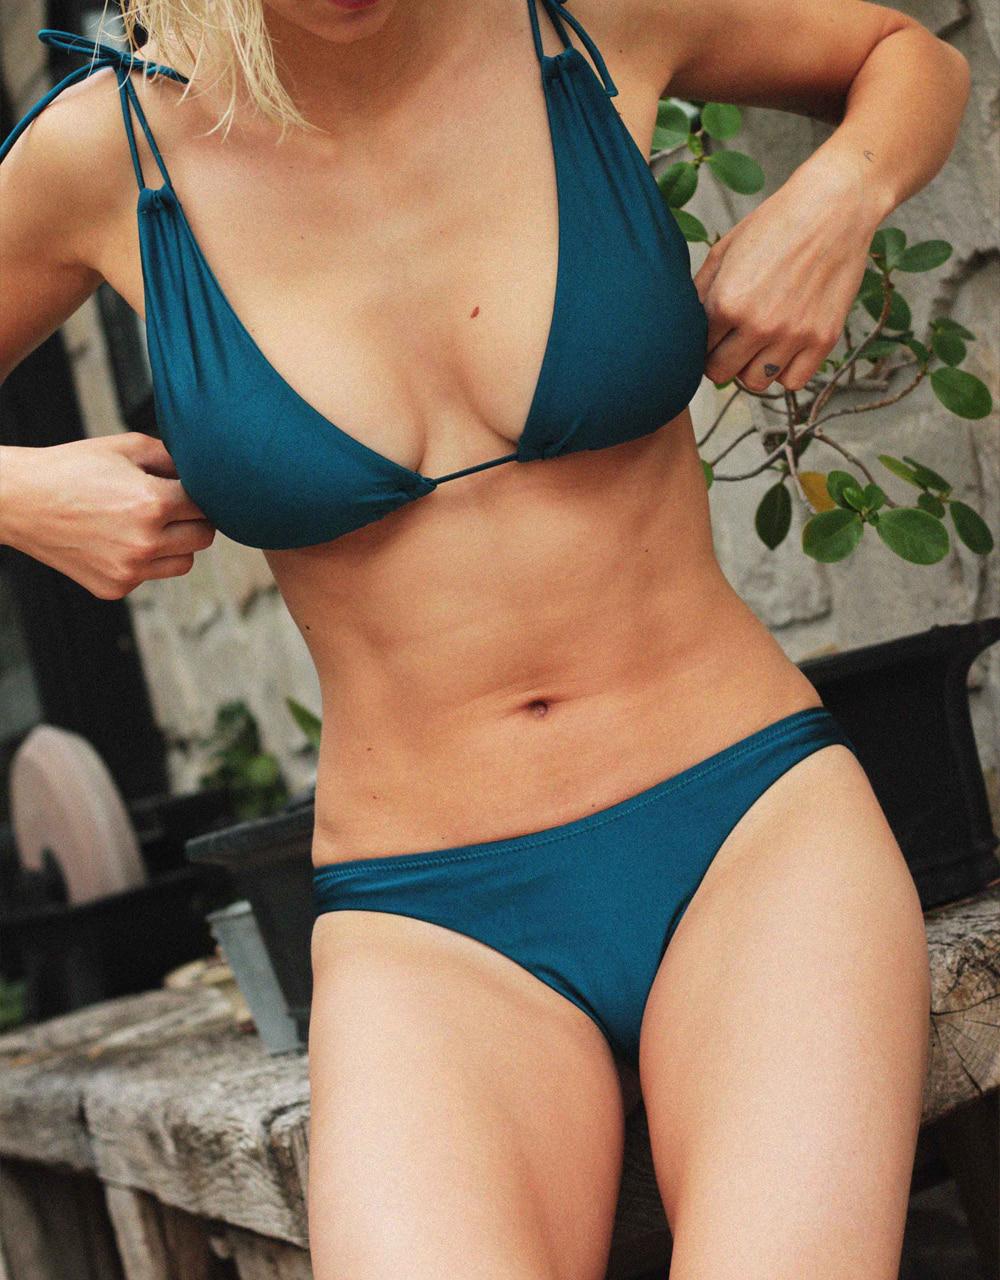 swimsuit bikini top Amalfi Blue 29 € Girls In Paris photo 3